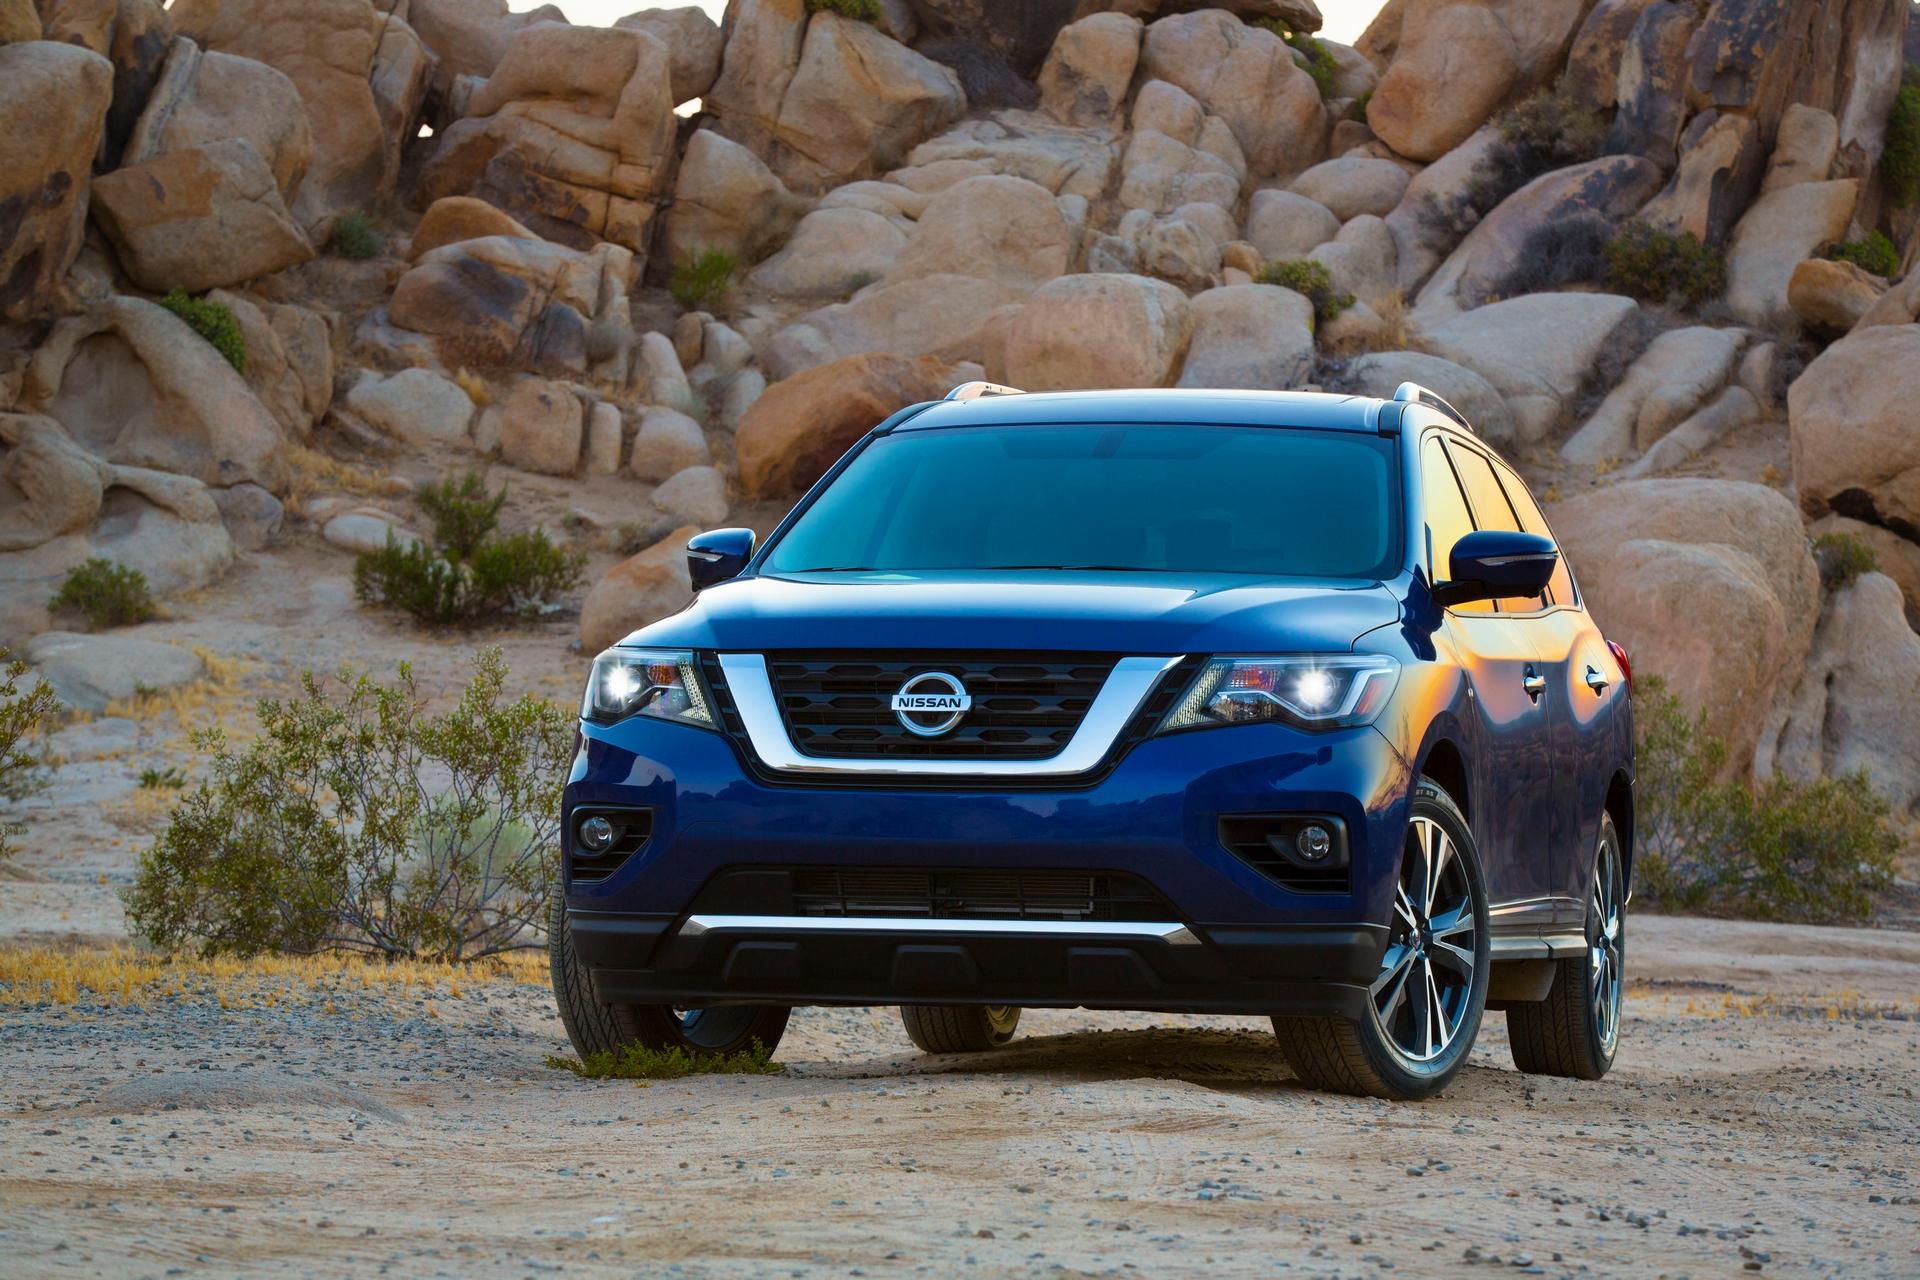 2017 Nissan Pathfinder © Nissan Motor Co., Ltd.